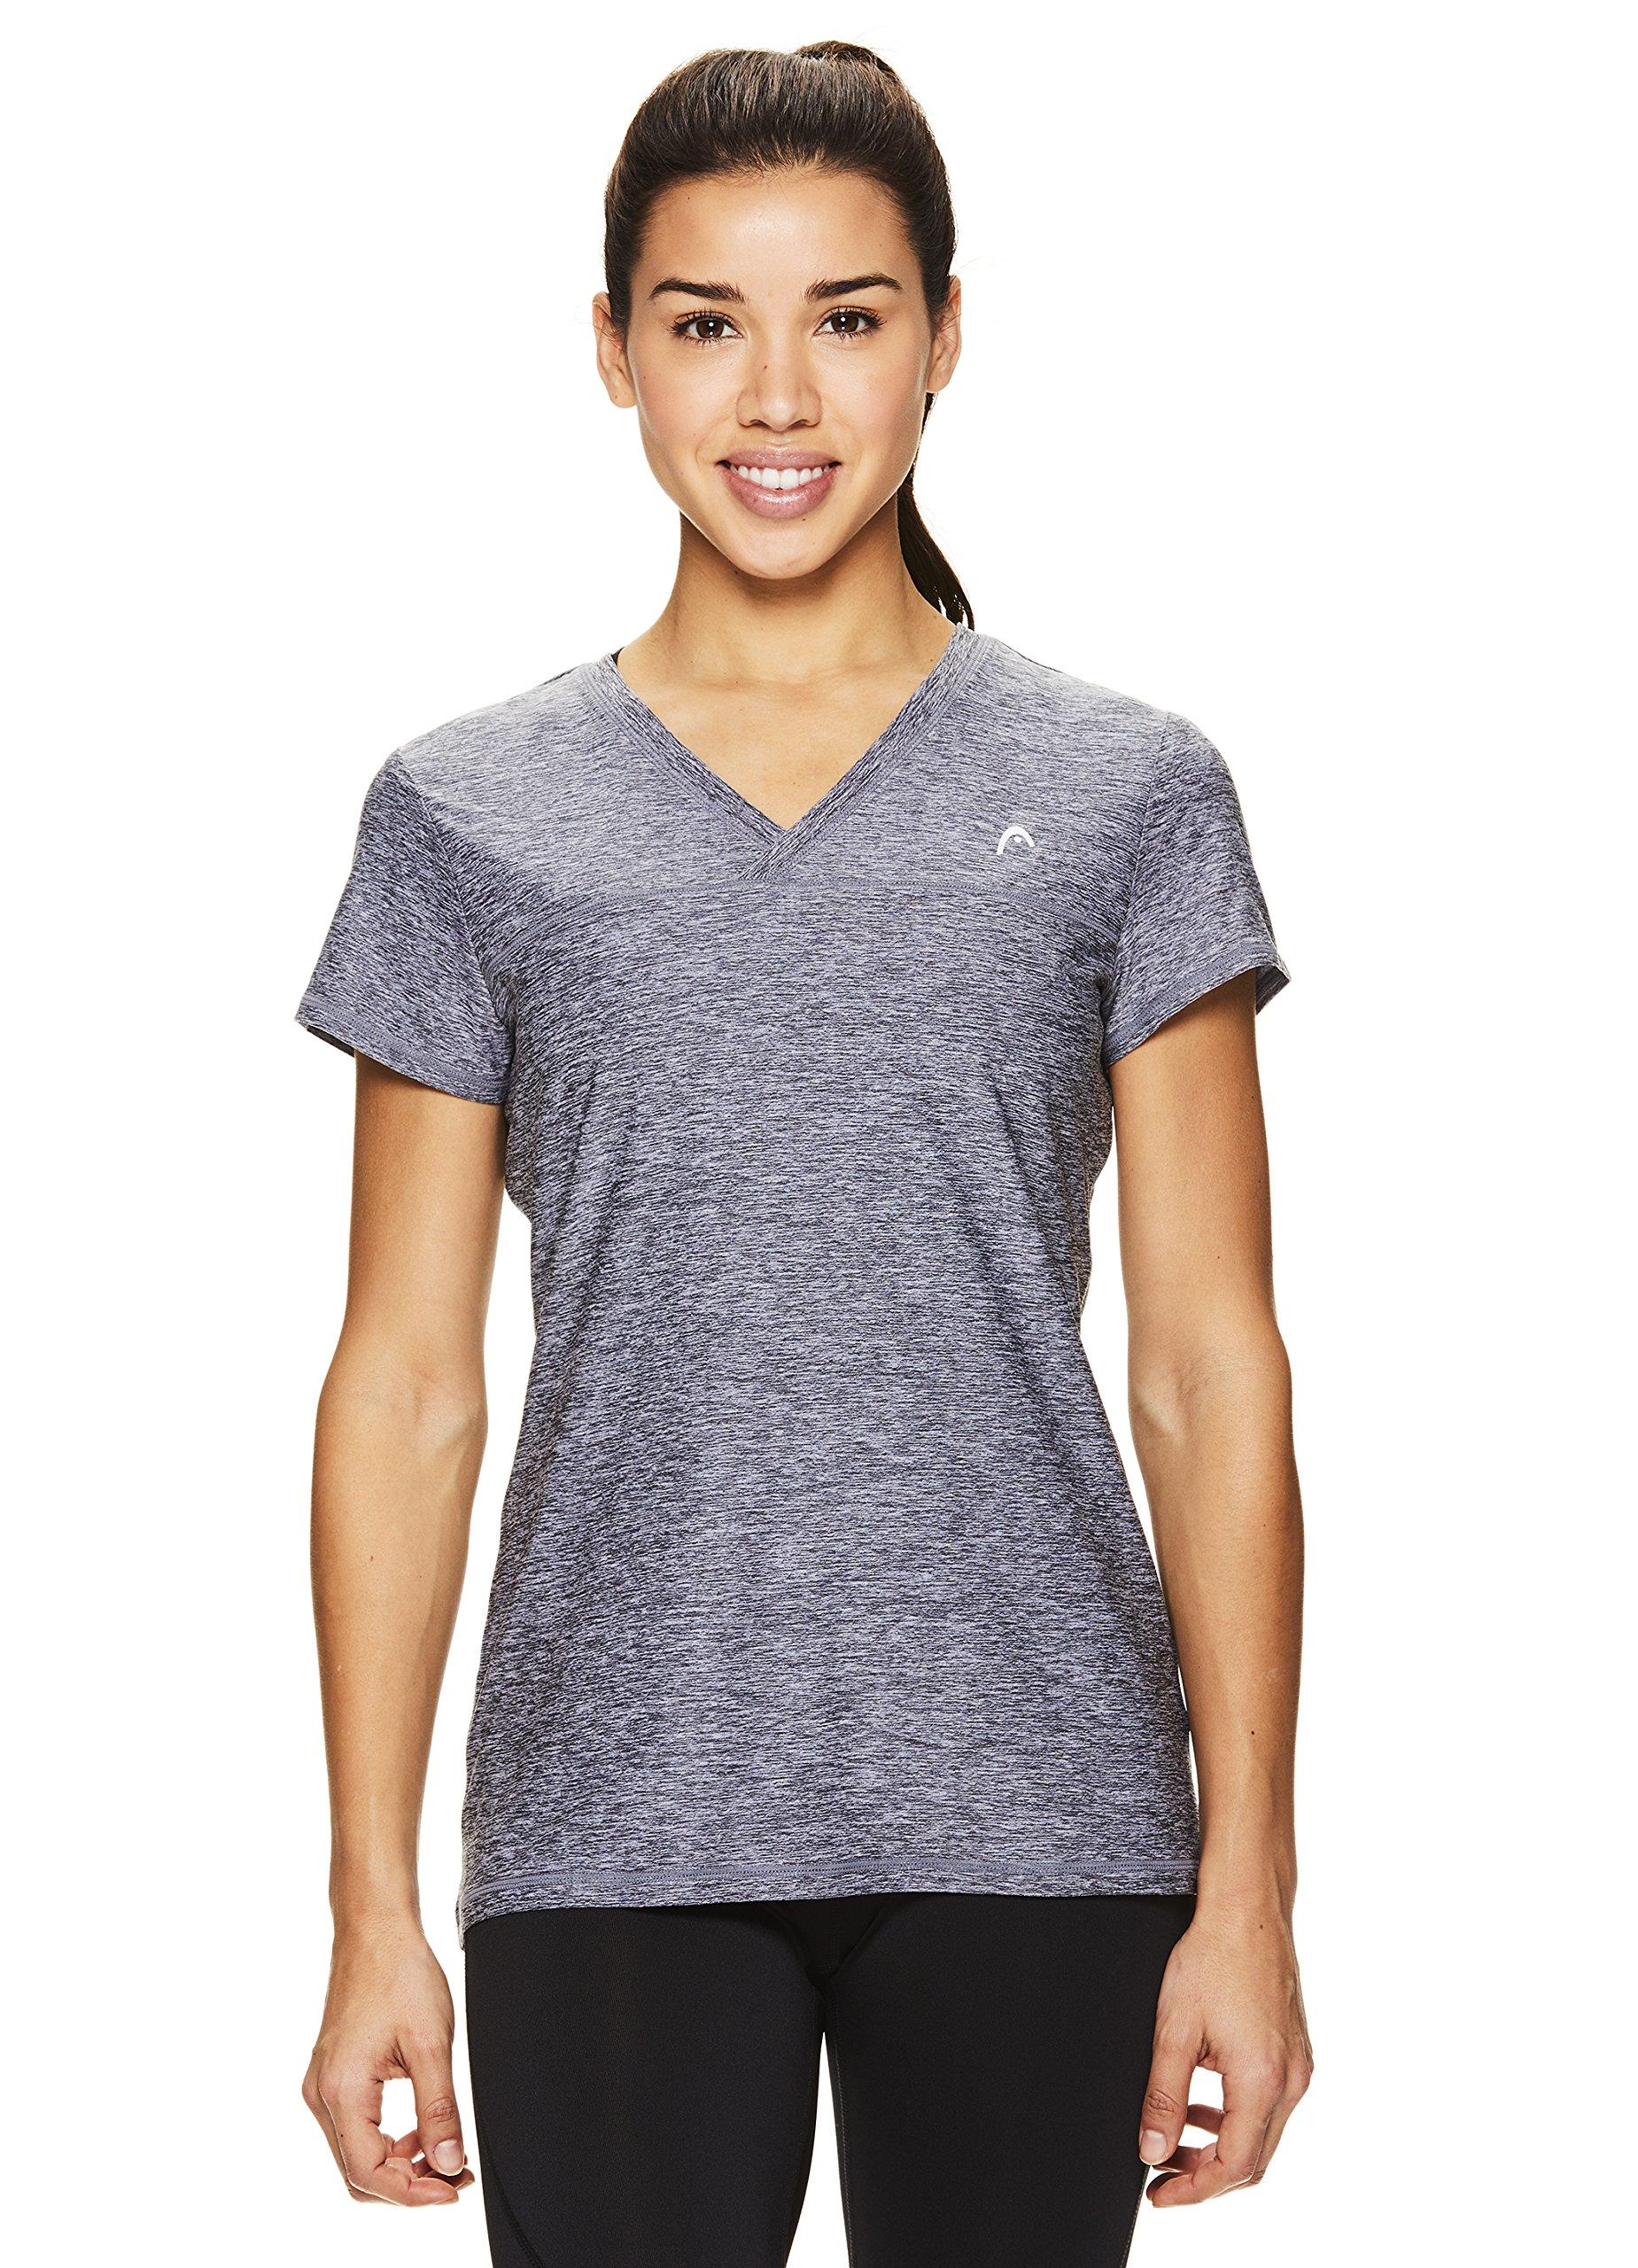 HEAD Women's High Jump Short Sleeve Workout T-Shirt - Performance V-Neck Activewear Top - Medium Grey Heather, X-Small